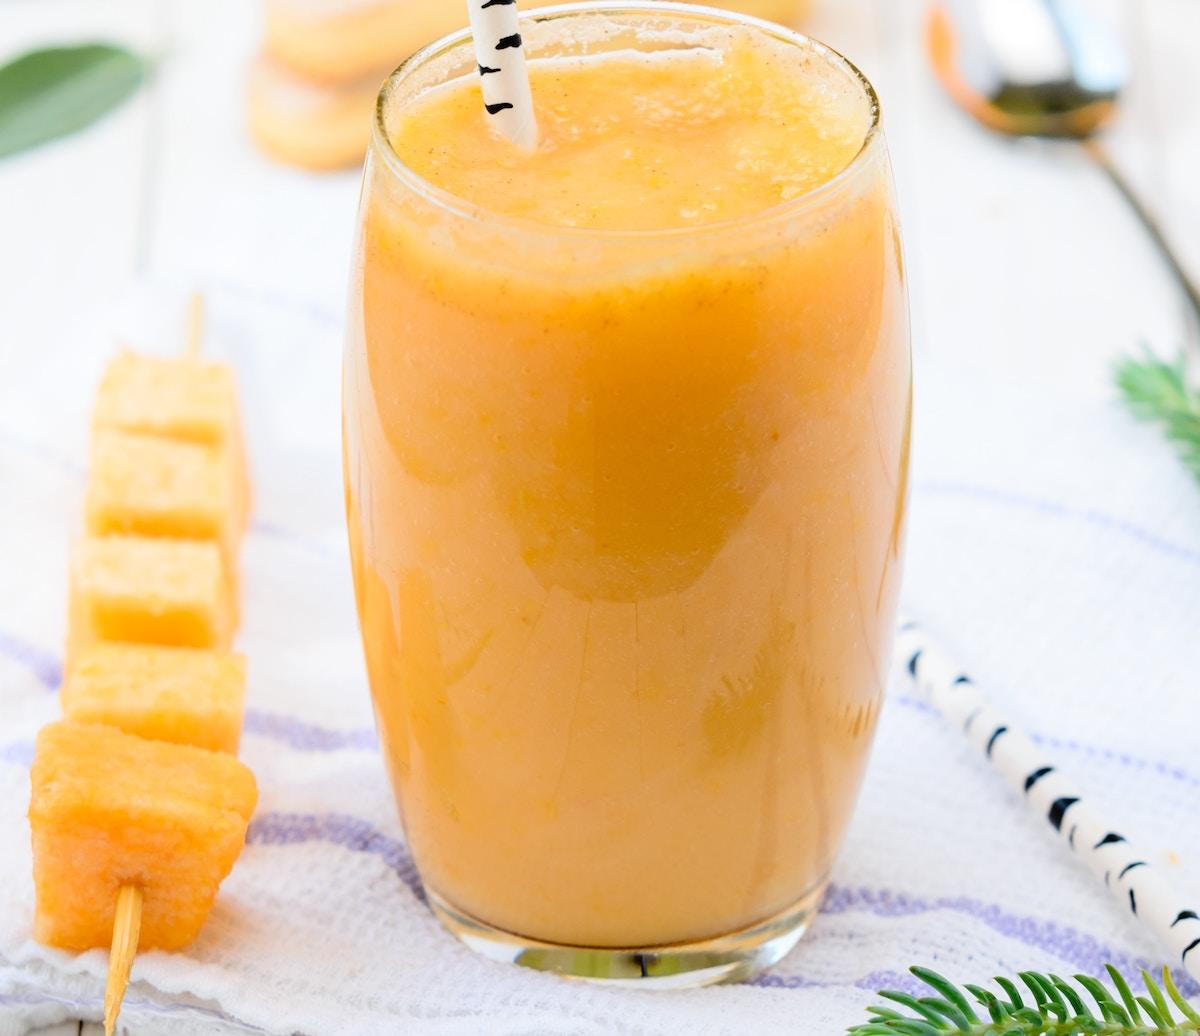 zumo de naranja verano